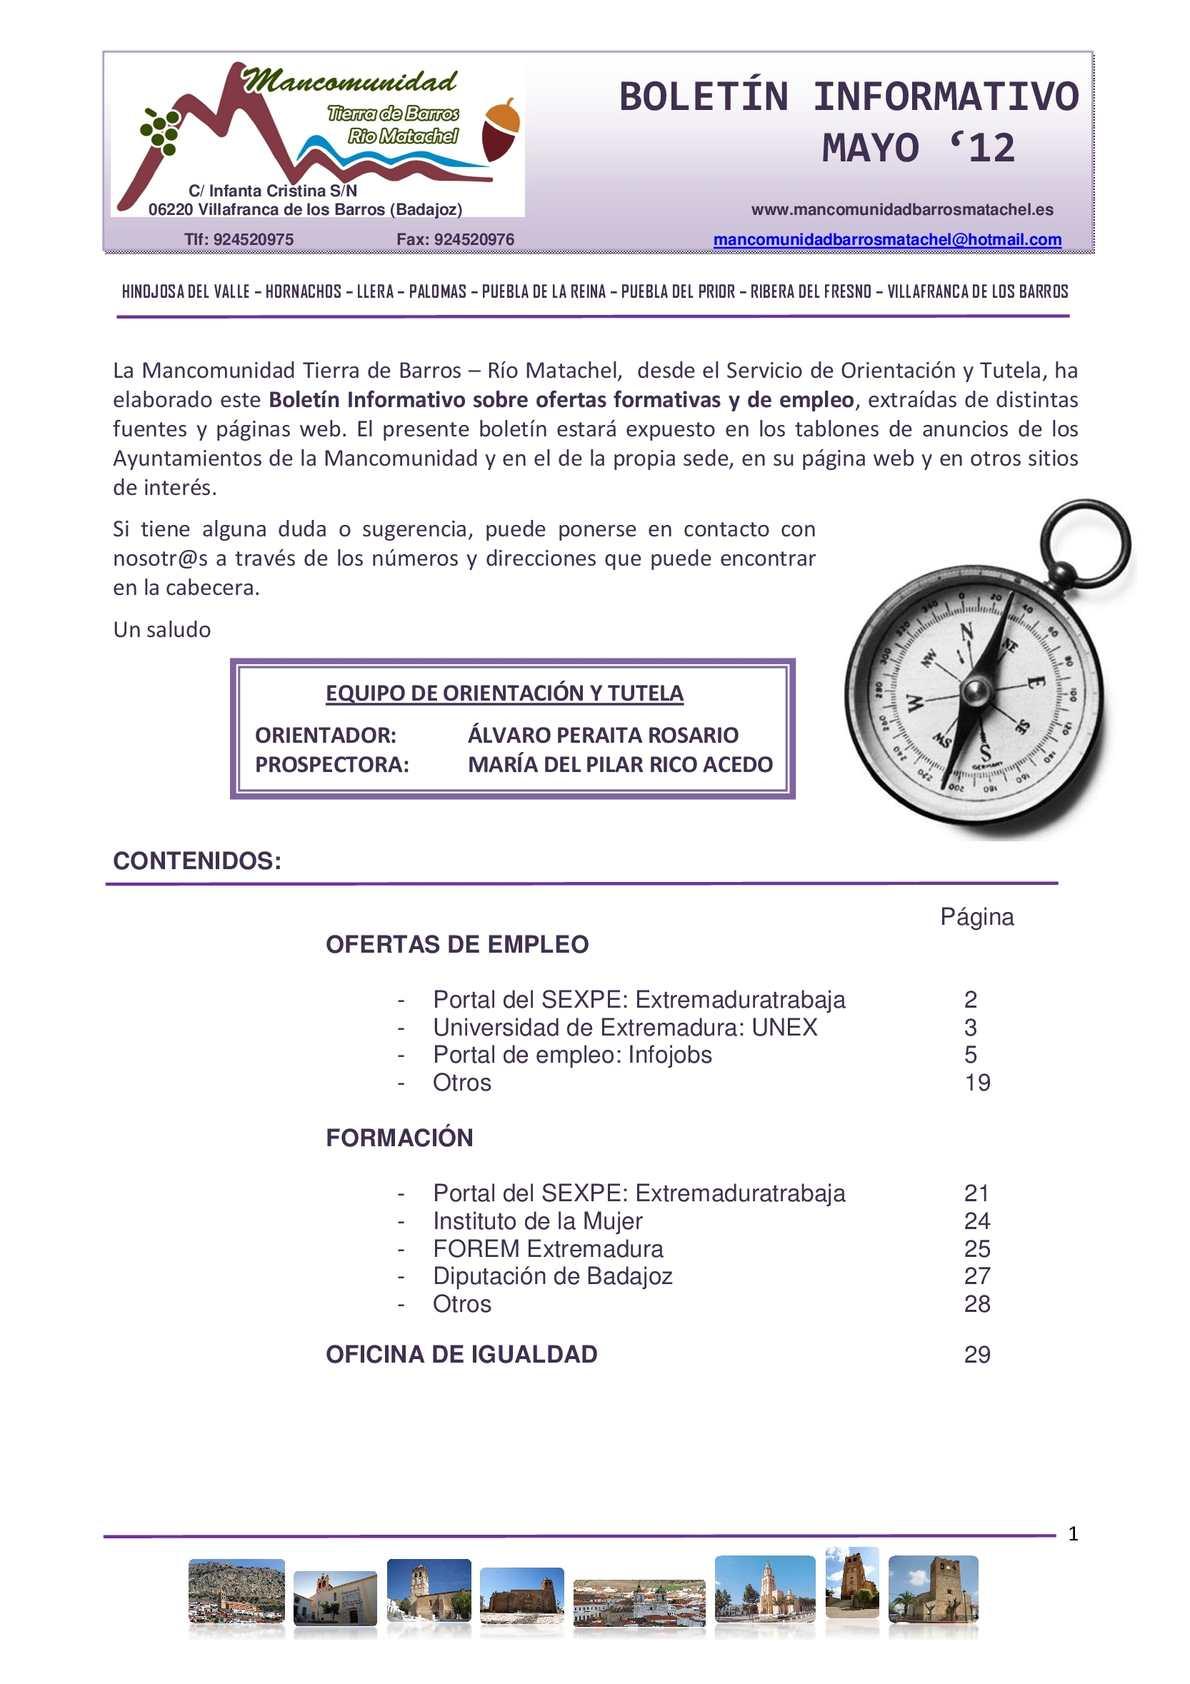 Calaméo - BOLETÍN MAYO